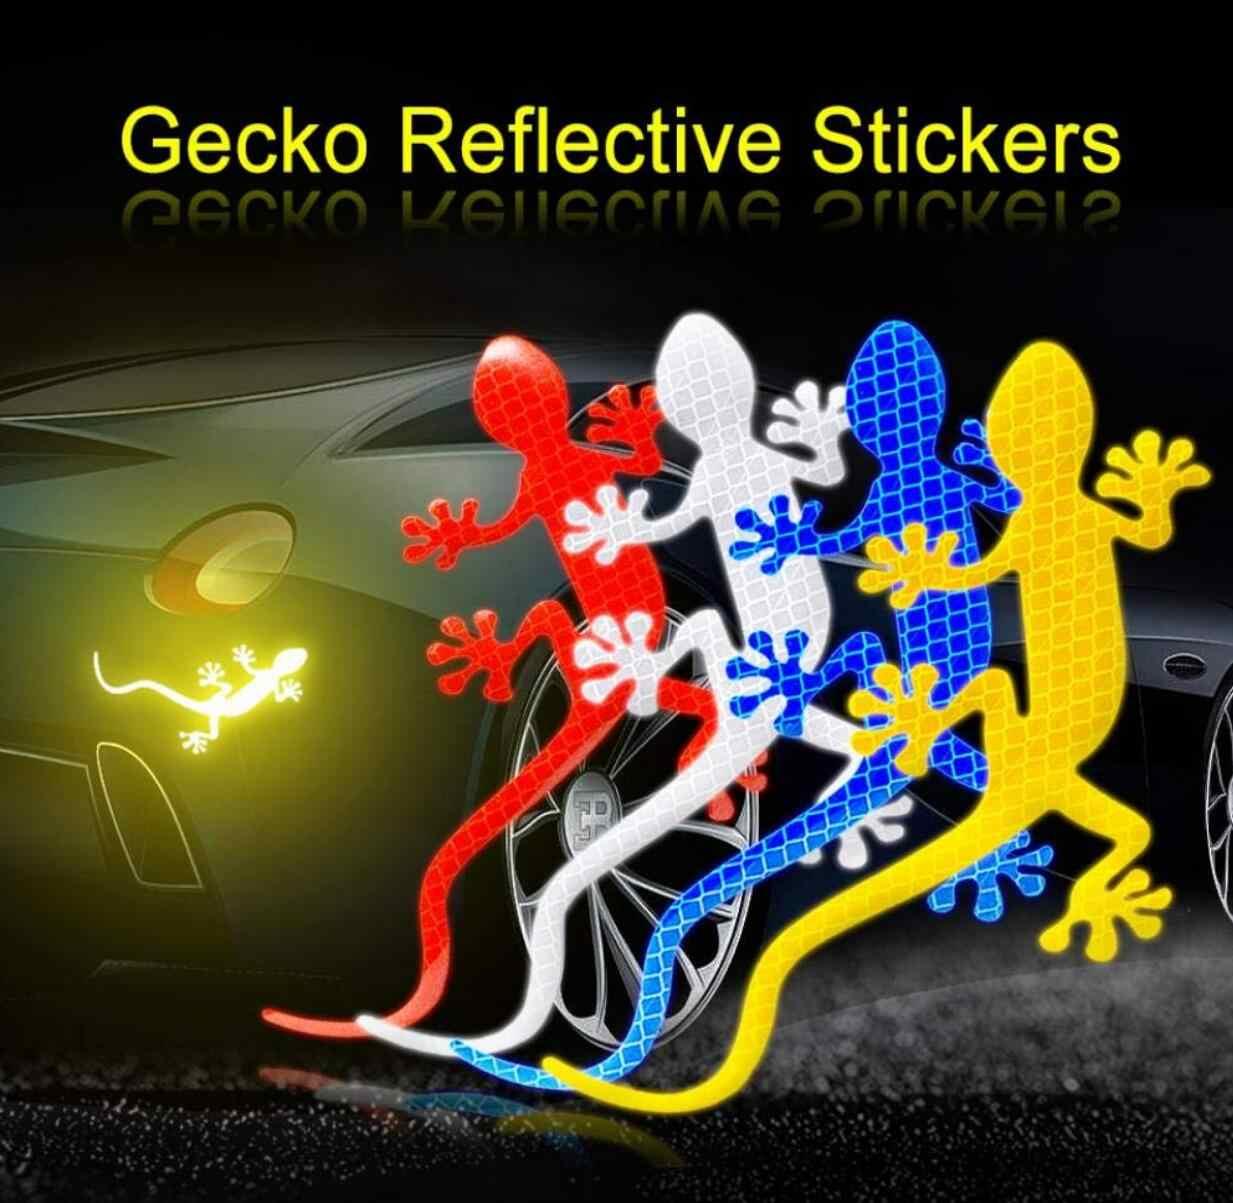 Fita automotiva refletora gecko, fita adesiva para carros ford st focus 2 focus 3 mondeo fiesta kuga mk2 mk3 mk4